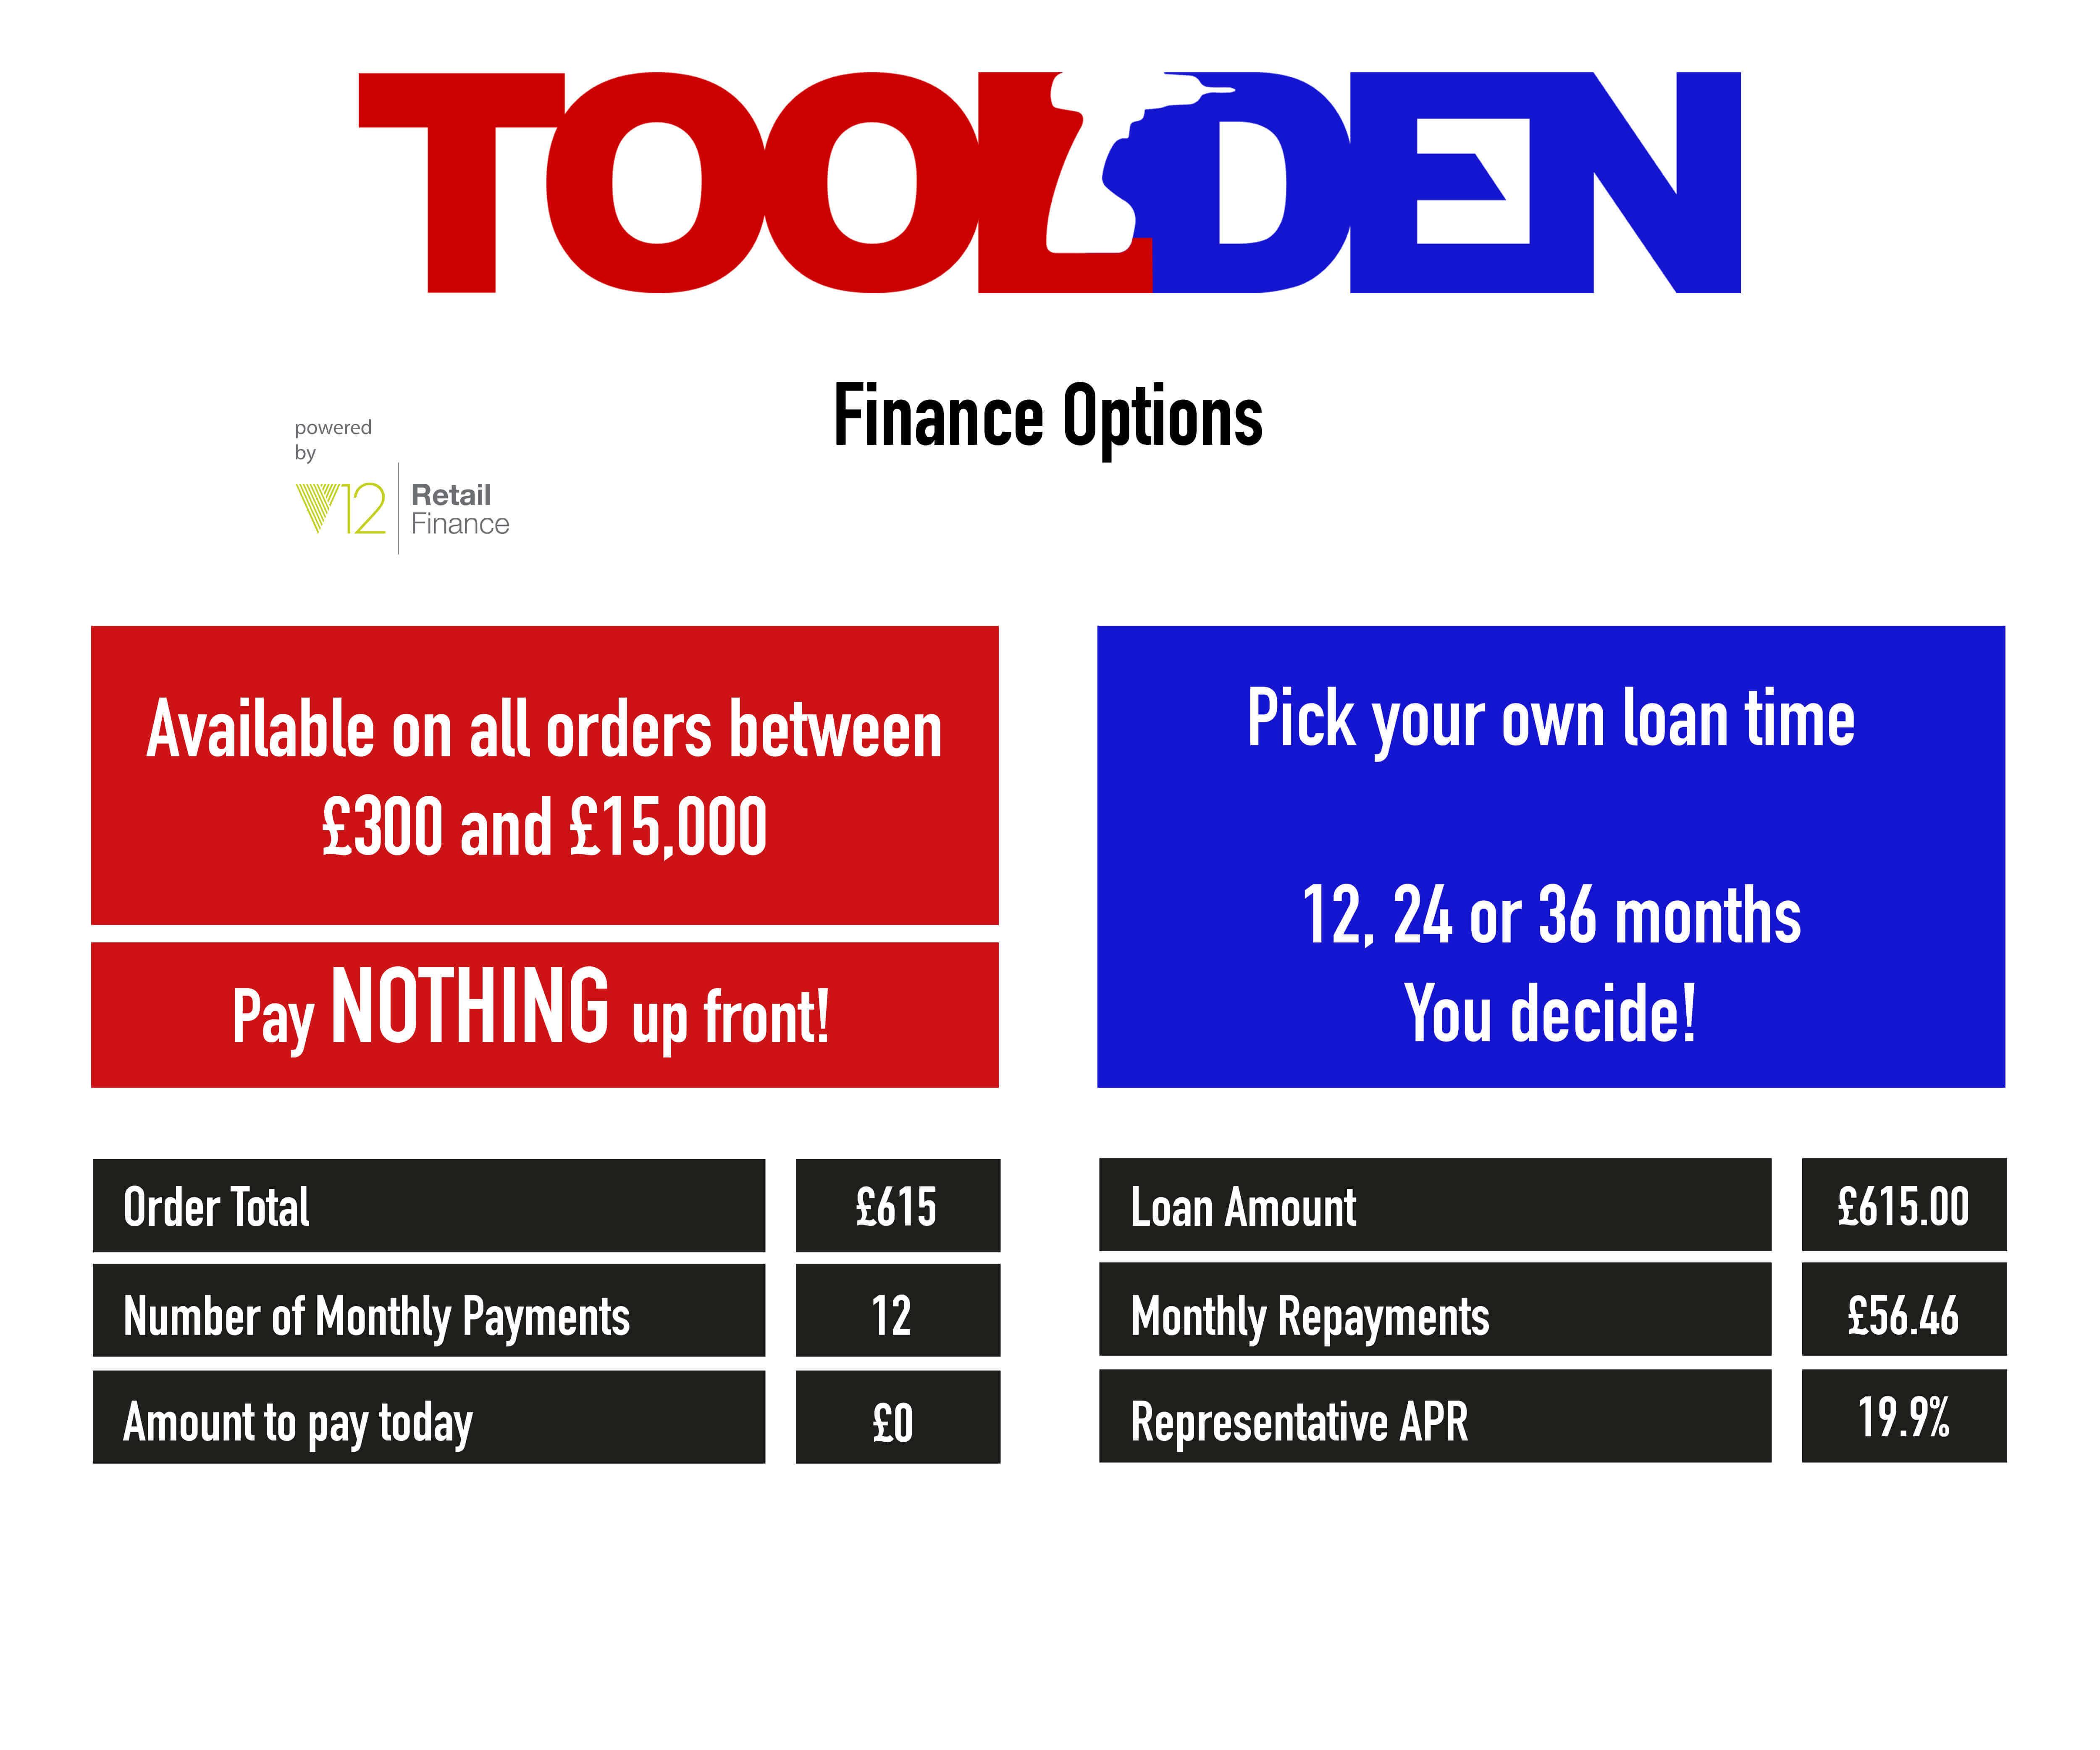 tooldenfinance-4.jpg